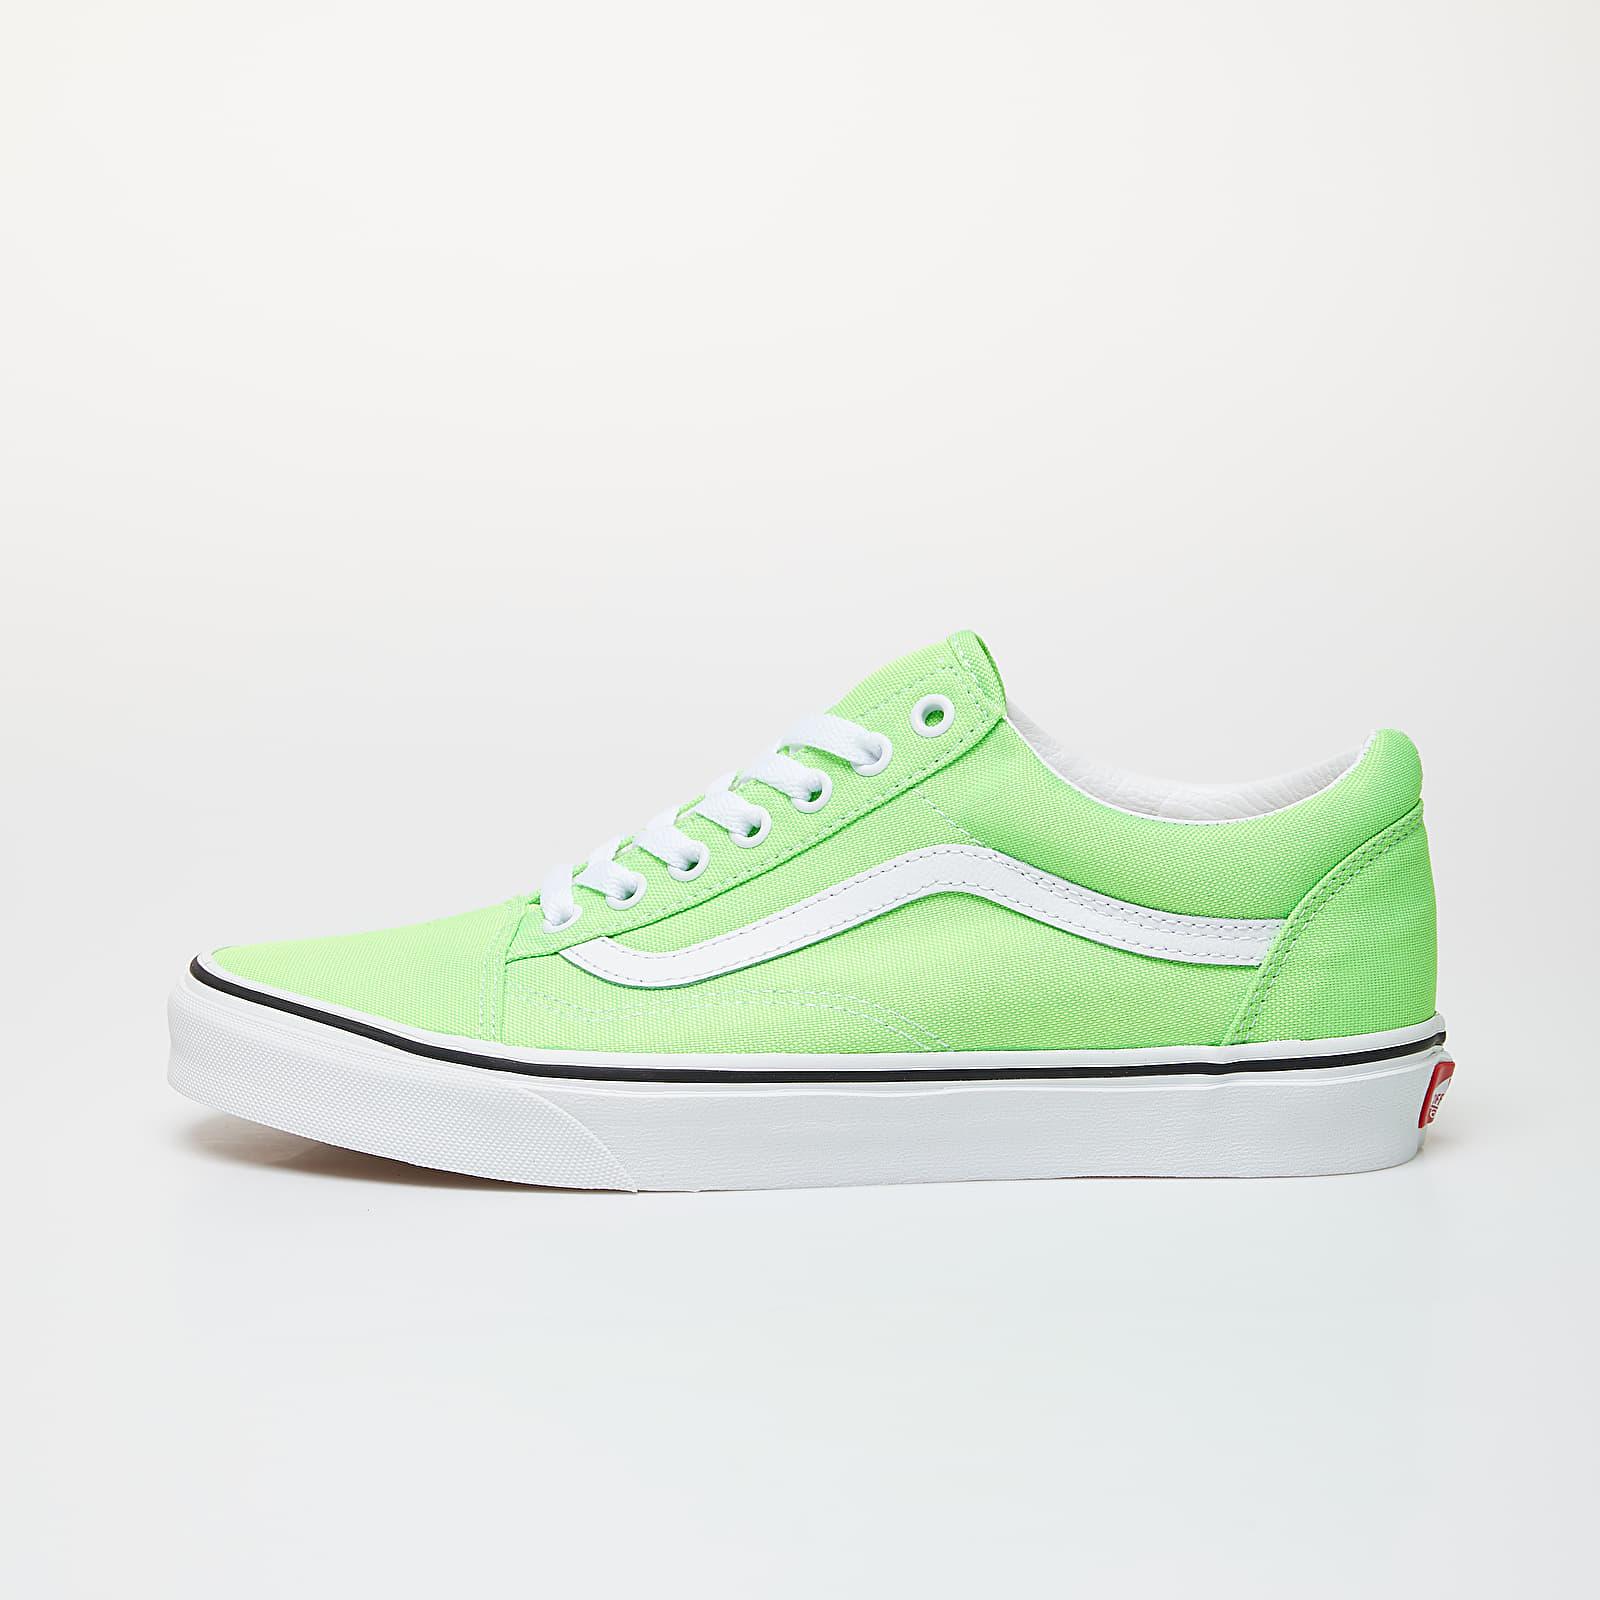 Men's shoes Vans Old Skool (Neon) Green Gecko/ True White